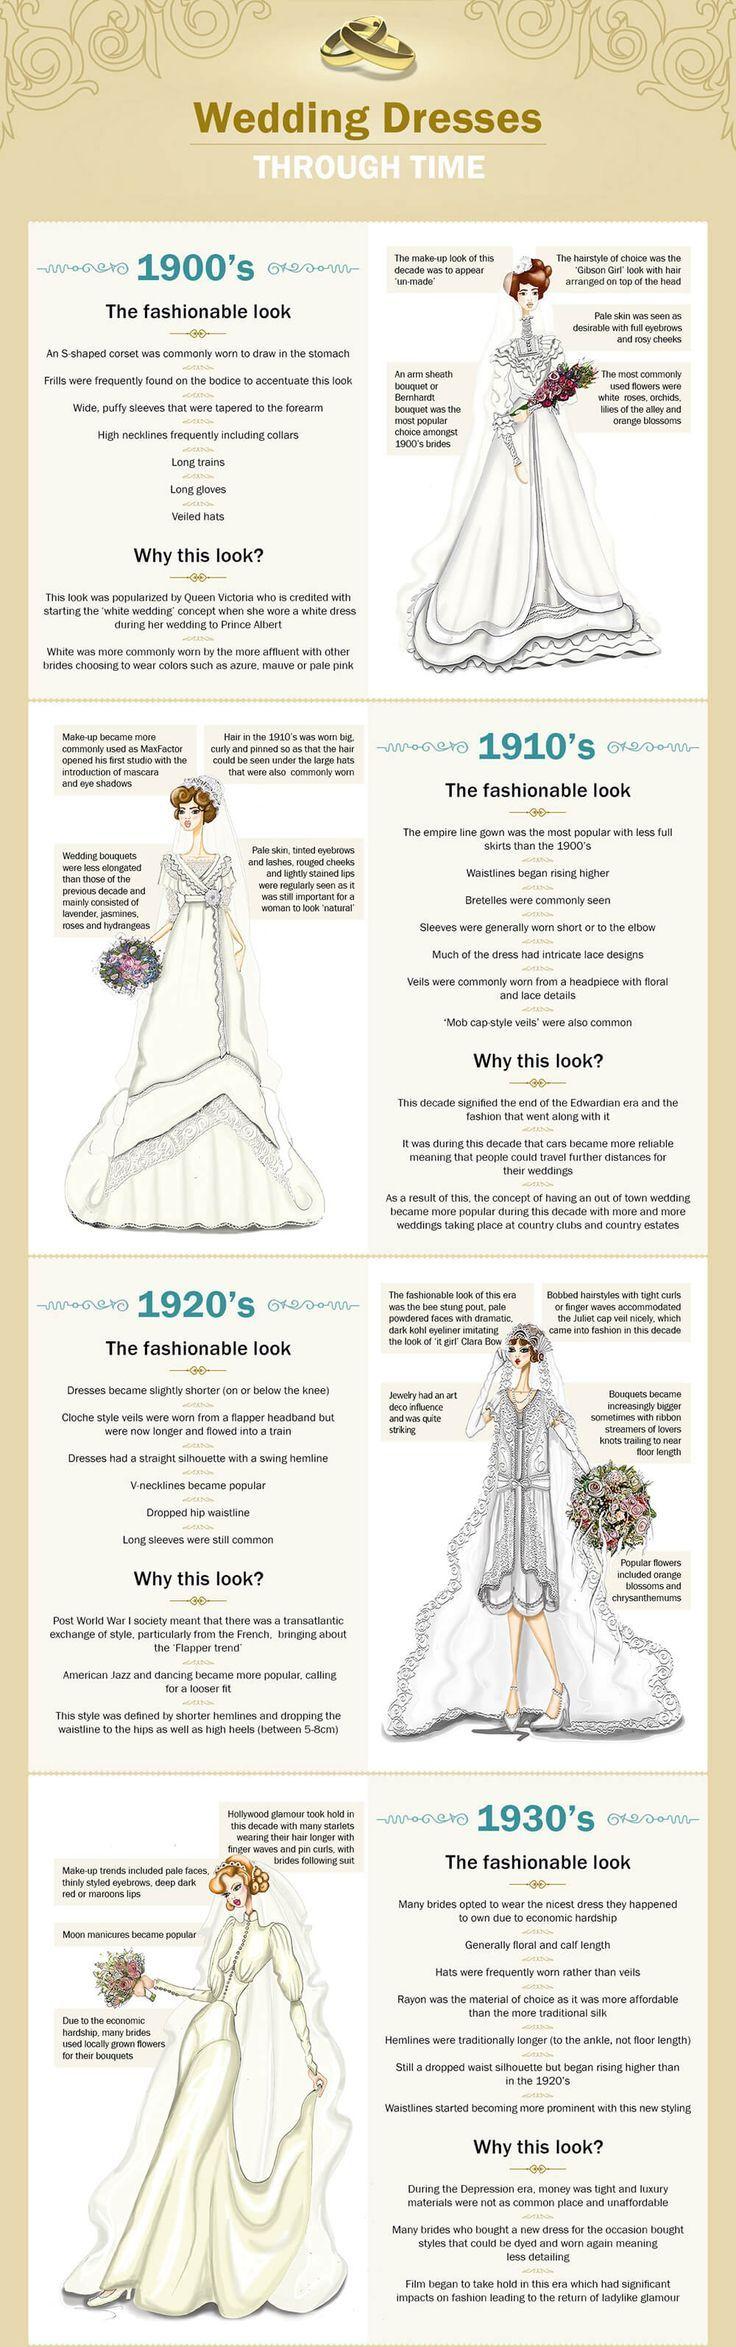 Wedding dresses through time by fairmont hotels u resorts via